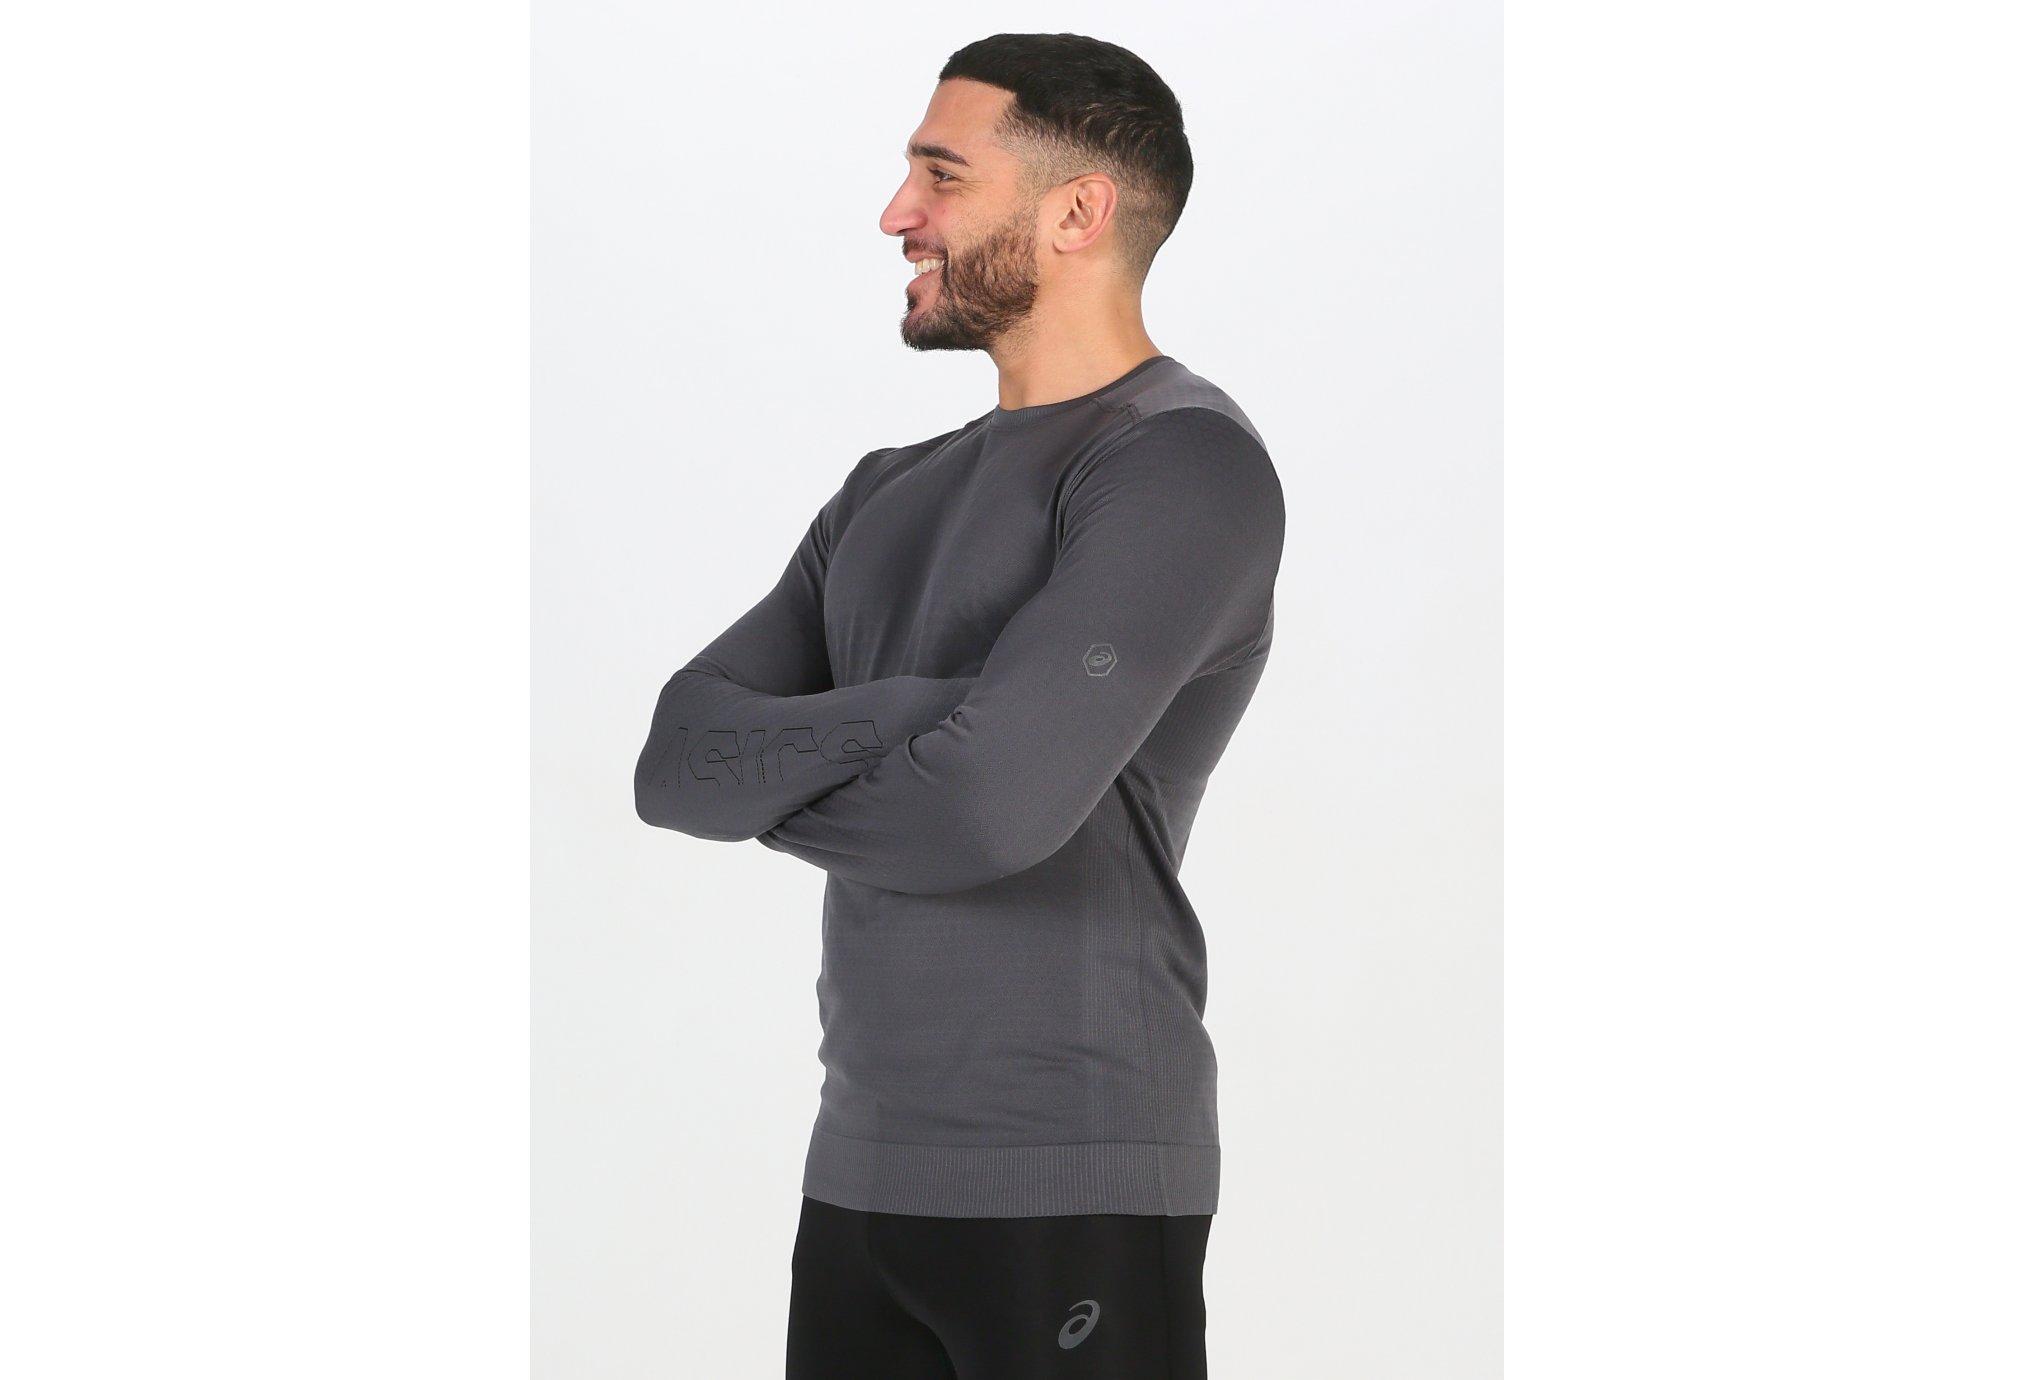 Asics FuzeX Seamless LS M vêtement running homme